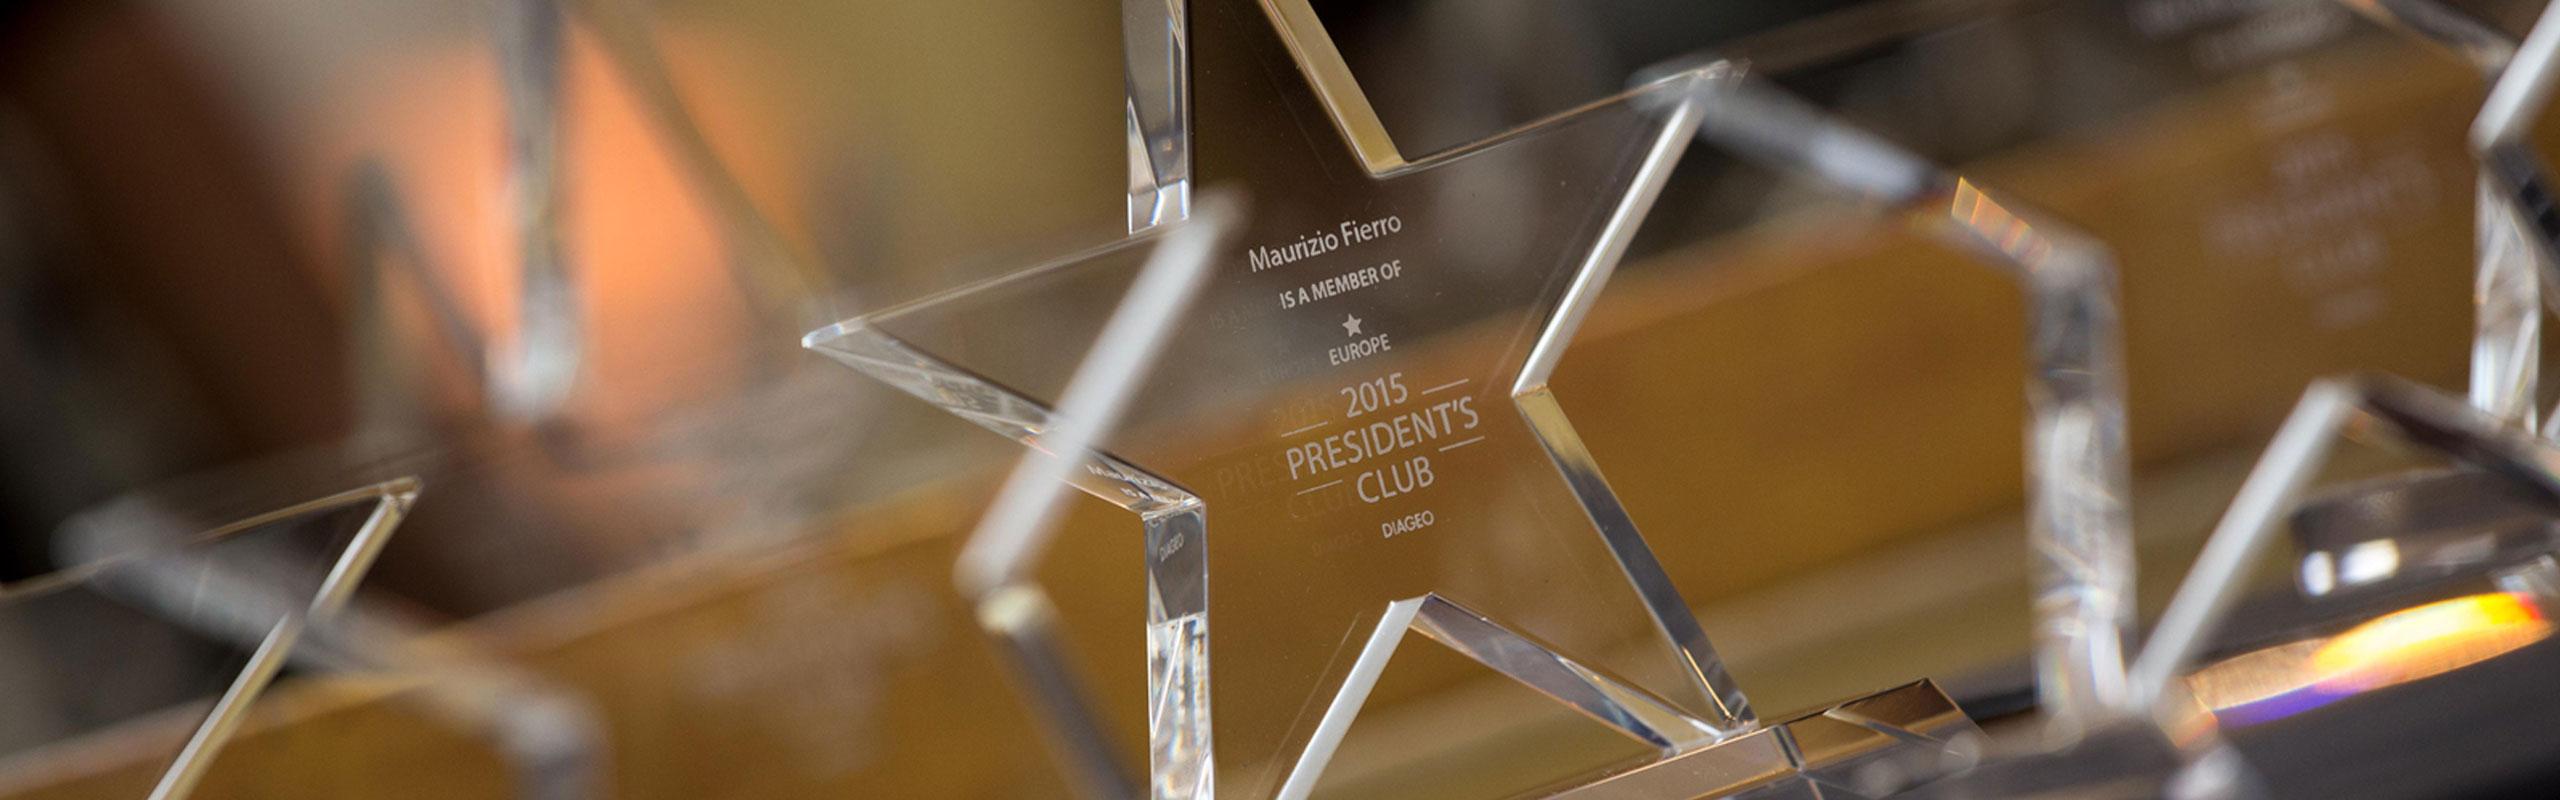 Diageo President's Club